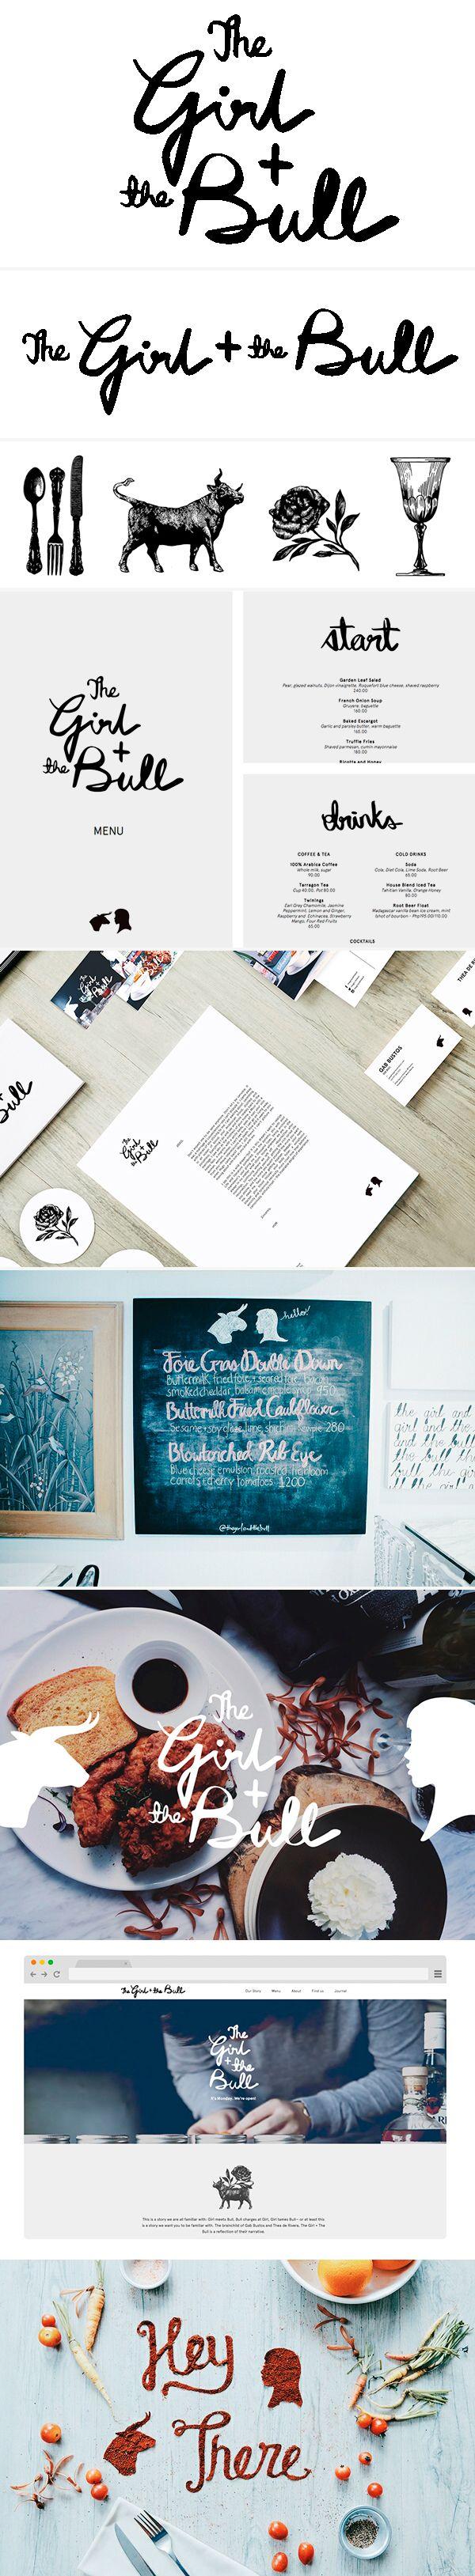 identity / the girl + the bull / restaurant | #stationary #corporate #design #corporatedesign #identity #branding #marketing repinned by www.BlickeDeeler.de | Visit our website: www.blickedeeler.de/leistungen/corporate-design